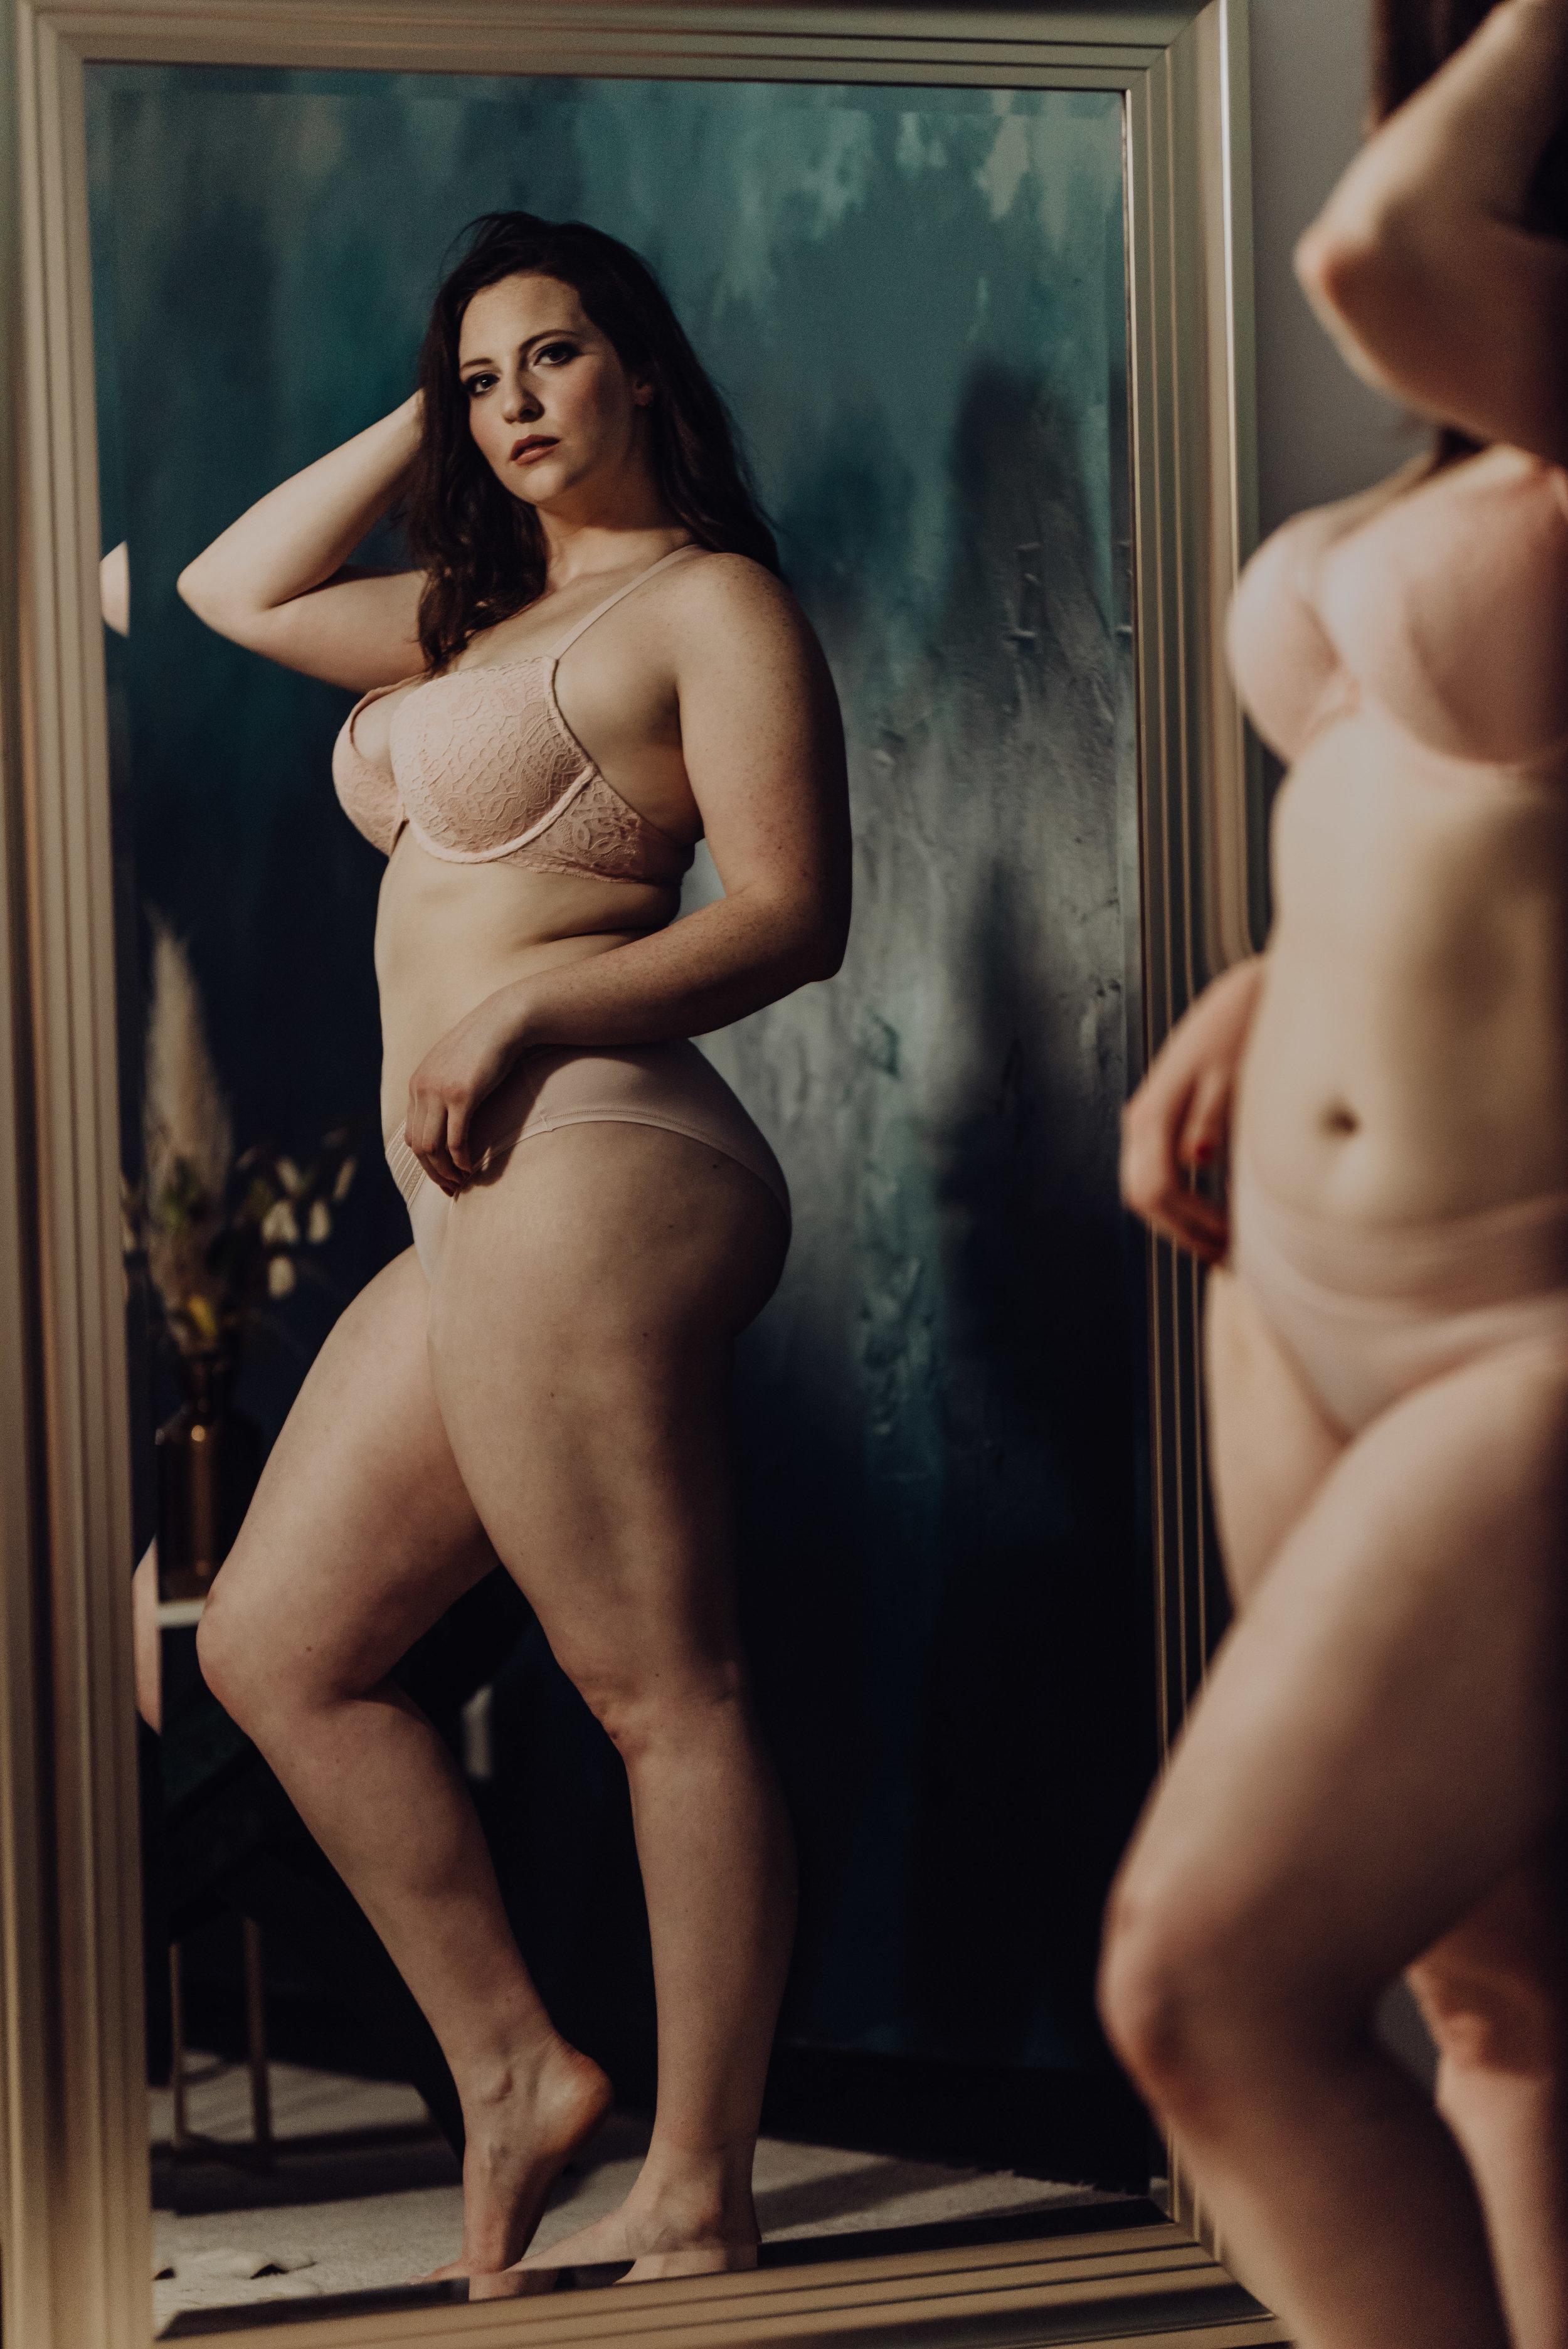 cat wilkinson nashville boudoir session by wilde company-46.jpg